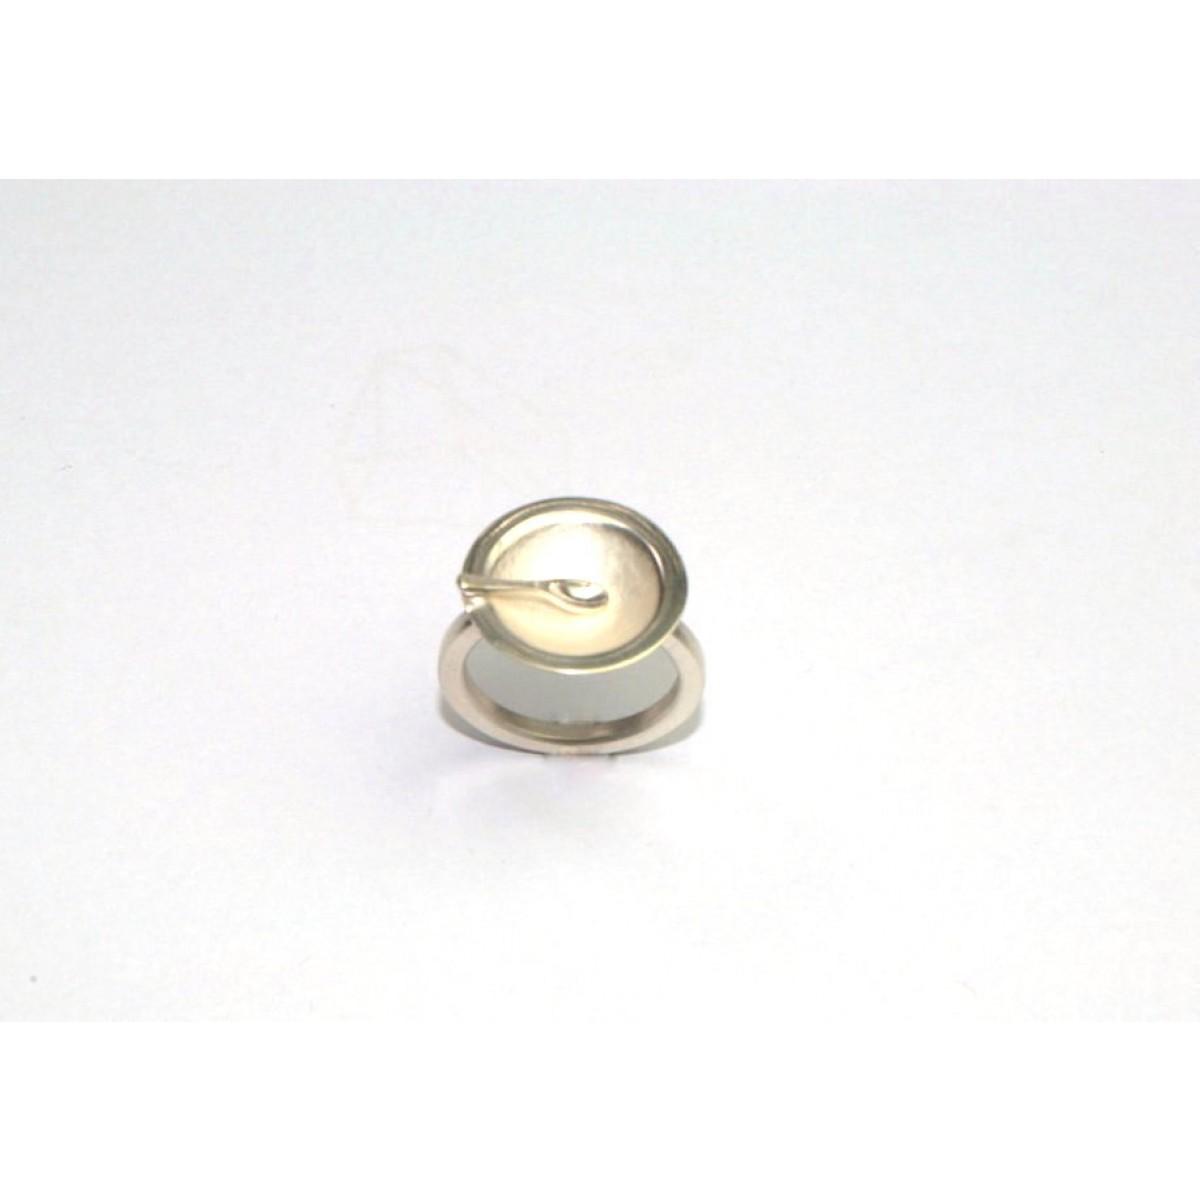 "TAFELSILBER  Ring ""Suppe"" aus 925/- Silber"